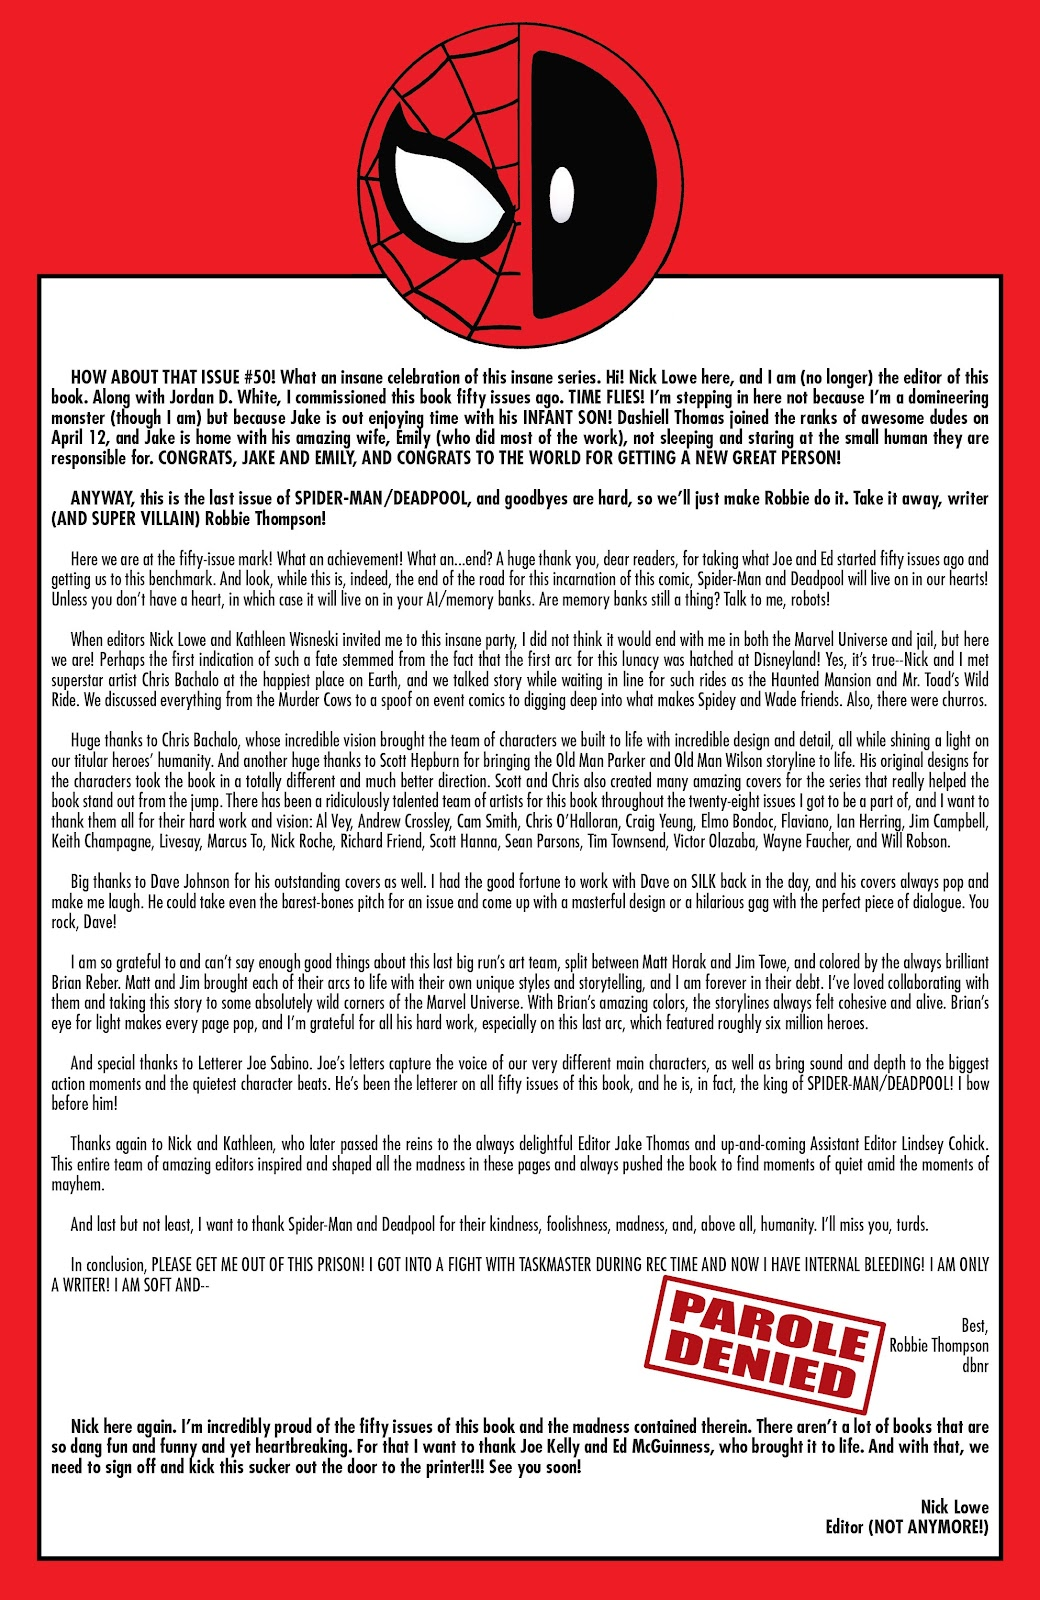 Read online Spider-Man/Deadpool comic -  Issue #50 - 30